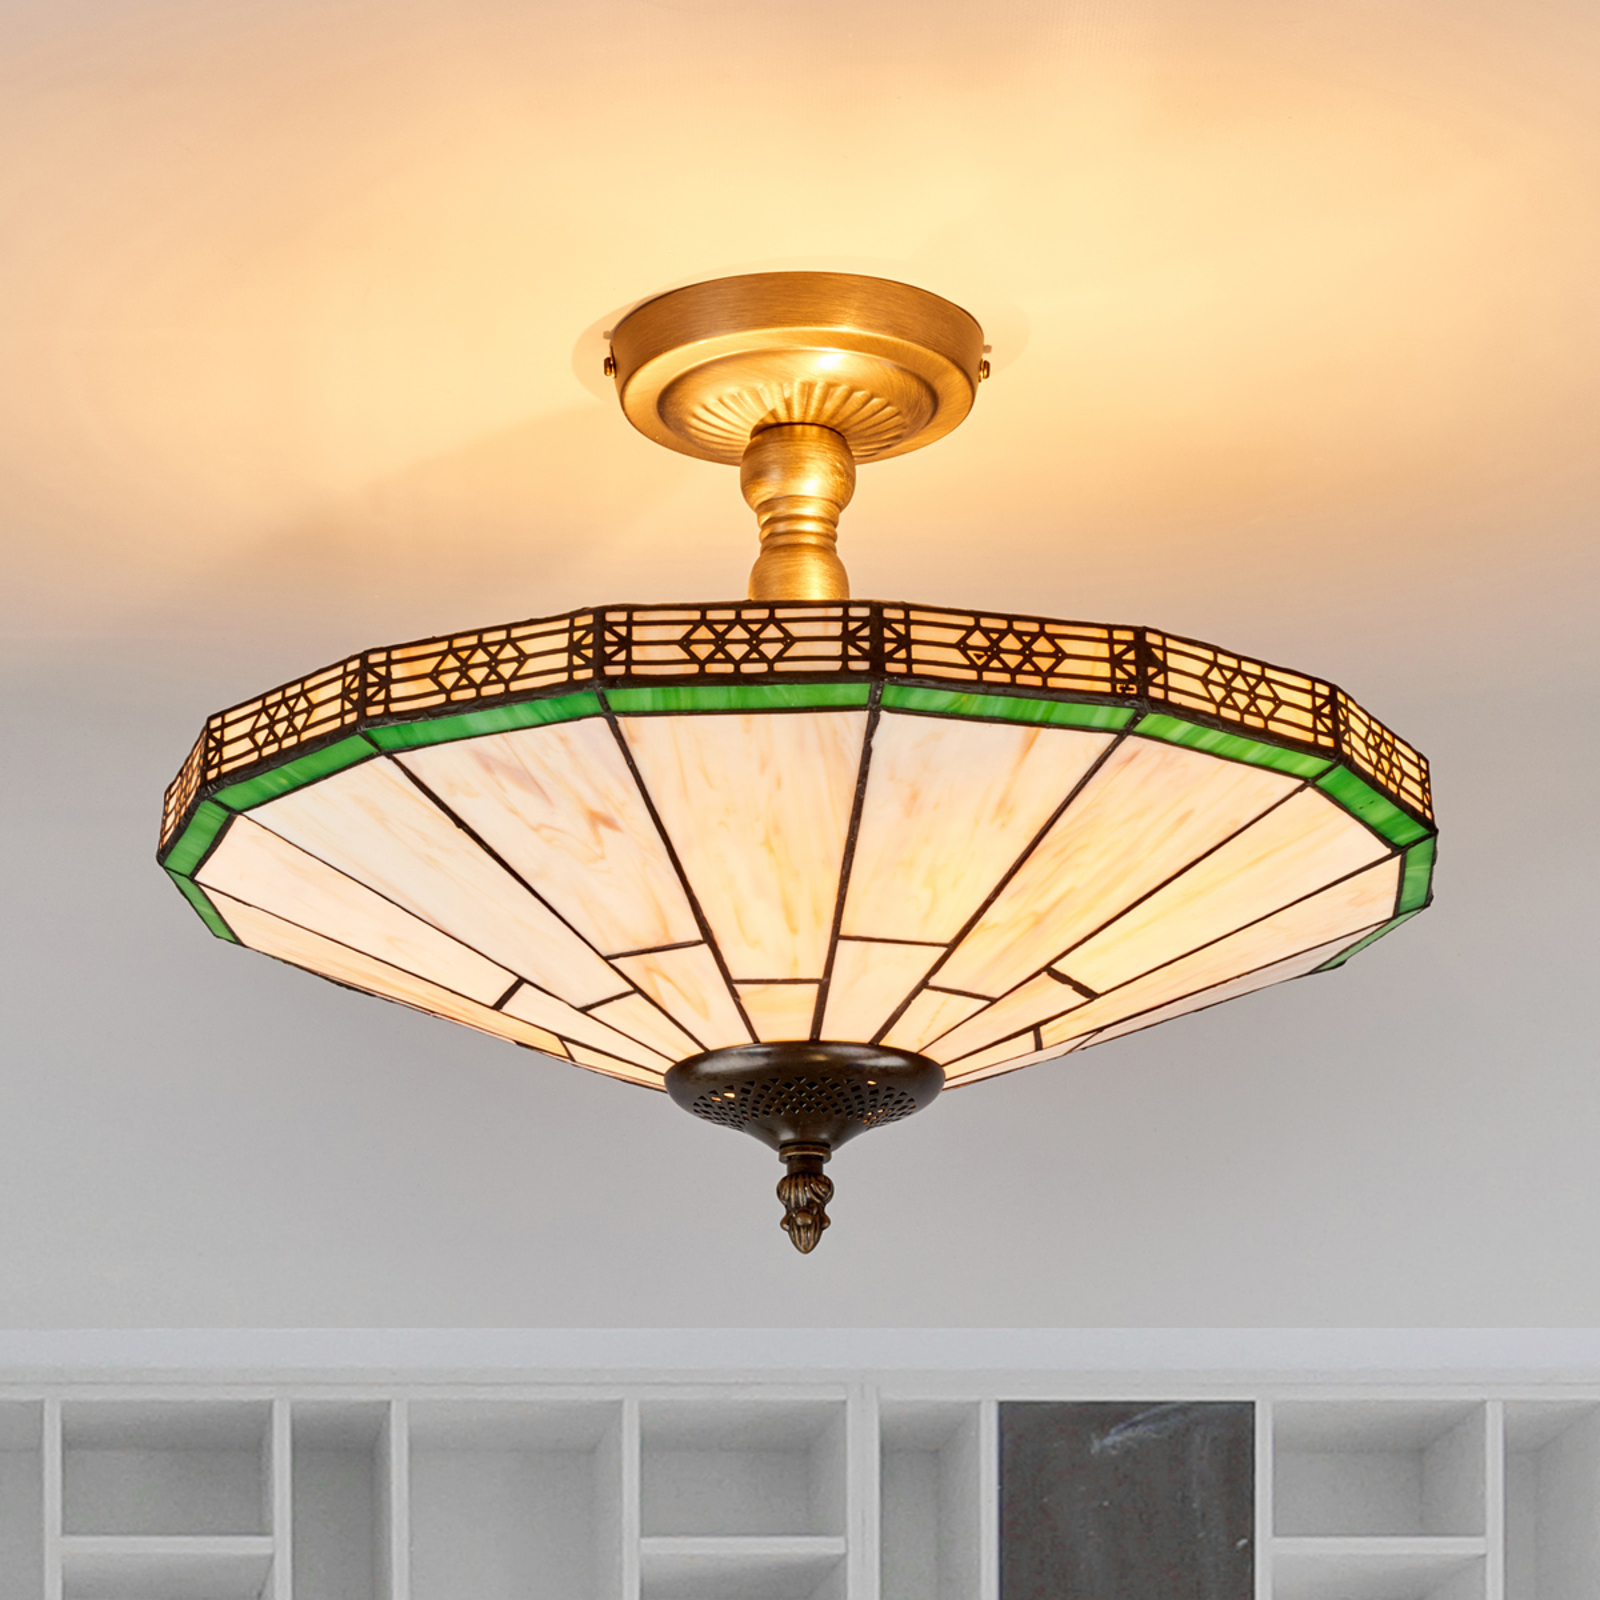 New York - klasyczna lampa sufitowa, styl Tiffany